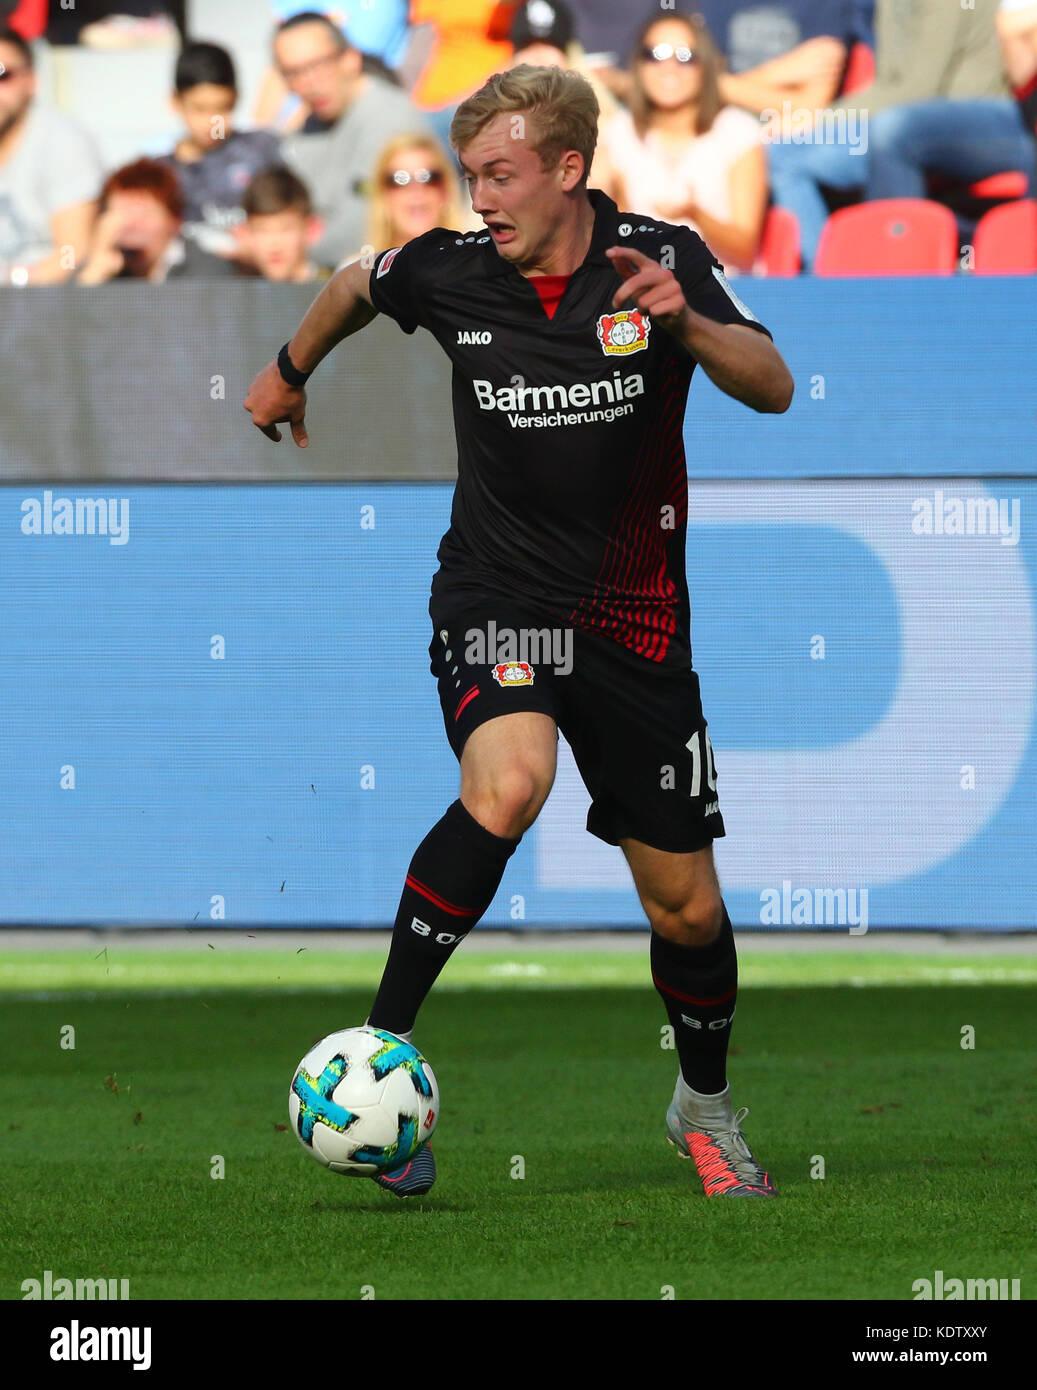 Leverkusen, Germany. 15th Oct, 2017. Leverkusen, Germany October 15 2017, Bundesliga matchday 9, Bayer 04 Leverkusen - Stock Image